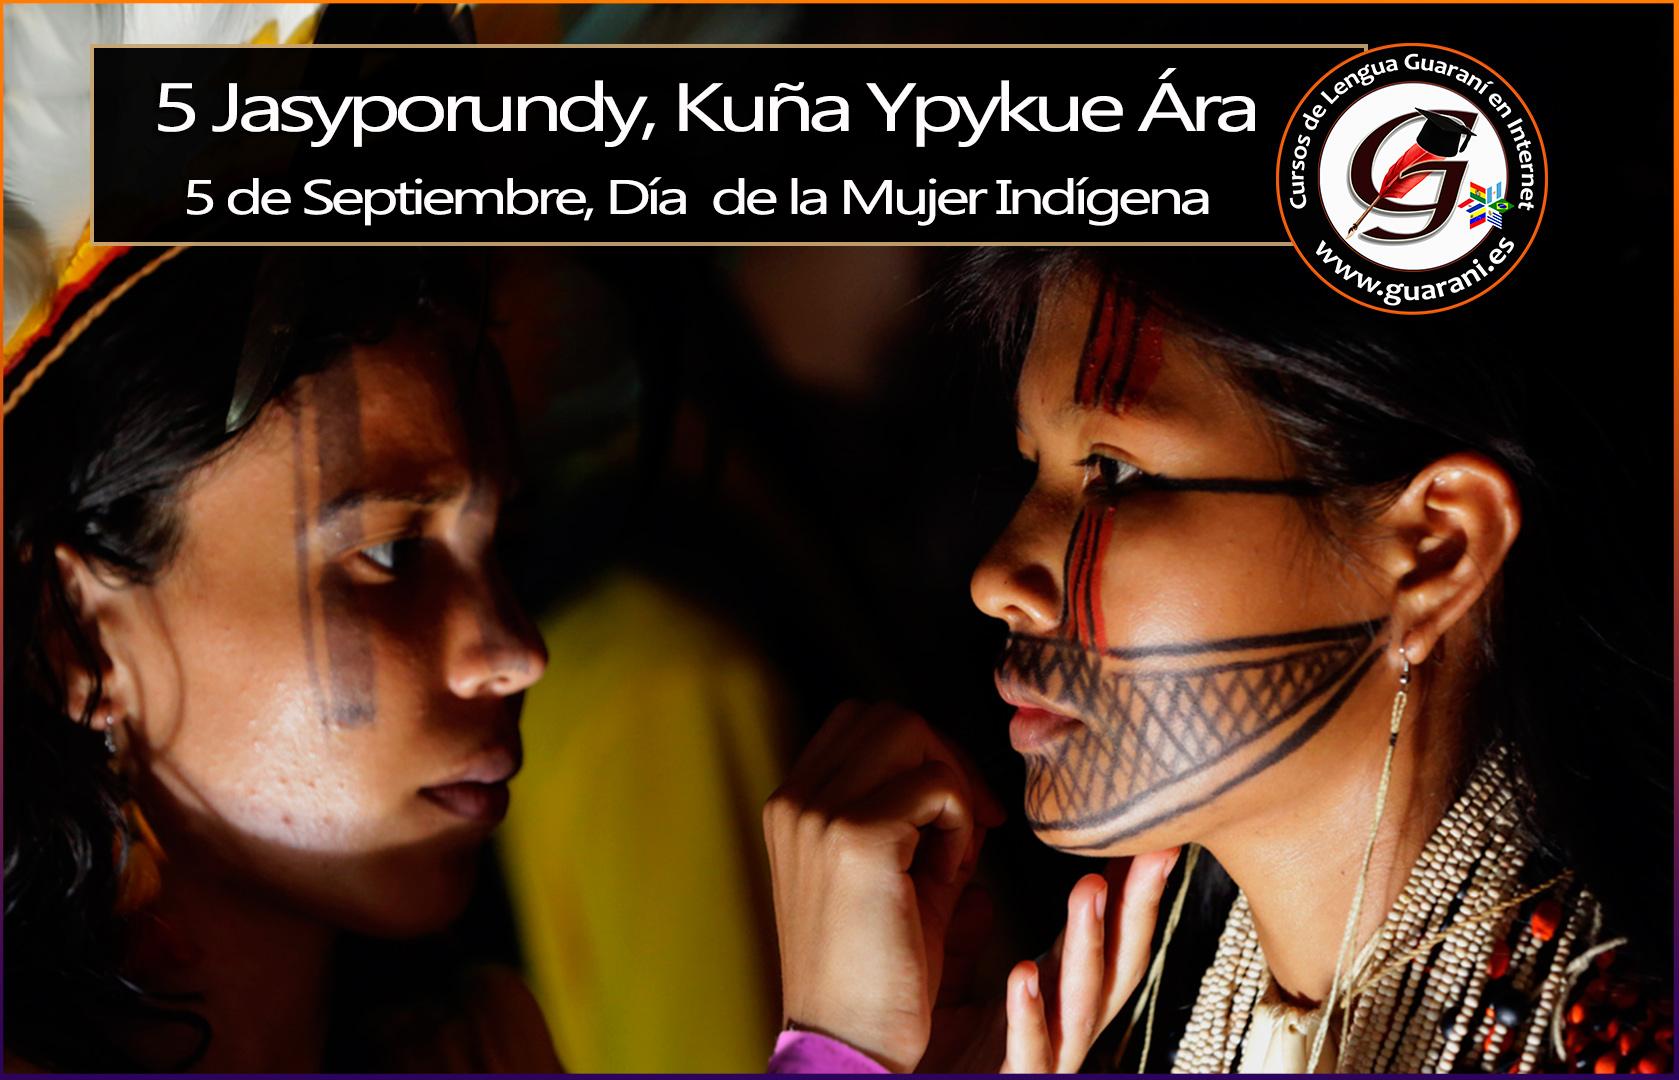 muer-indigenar